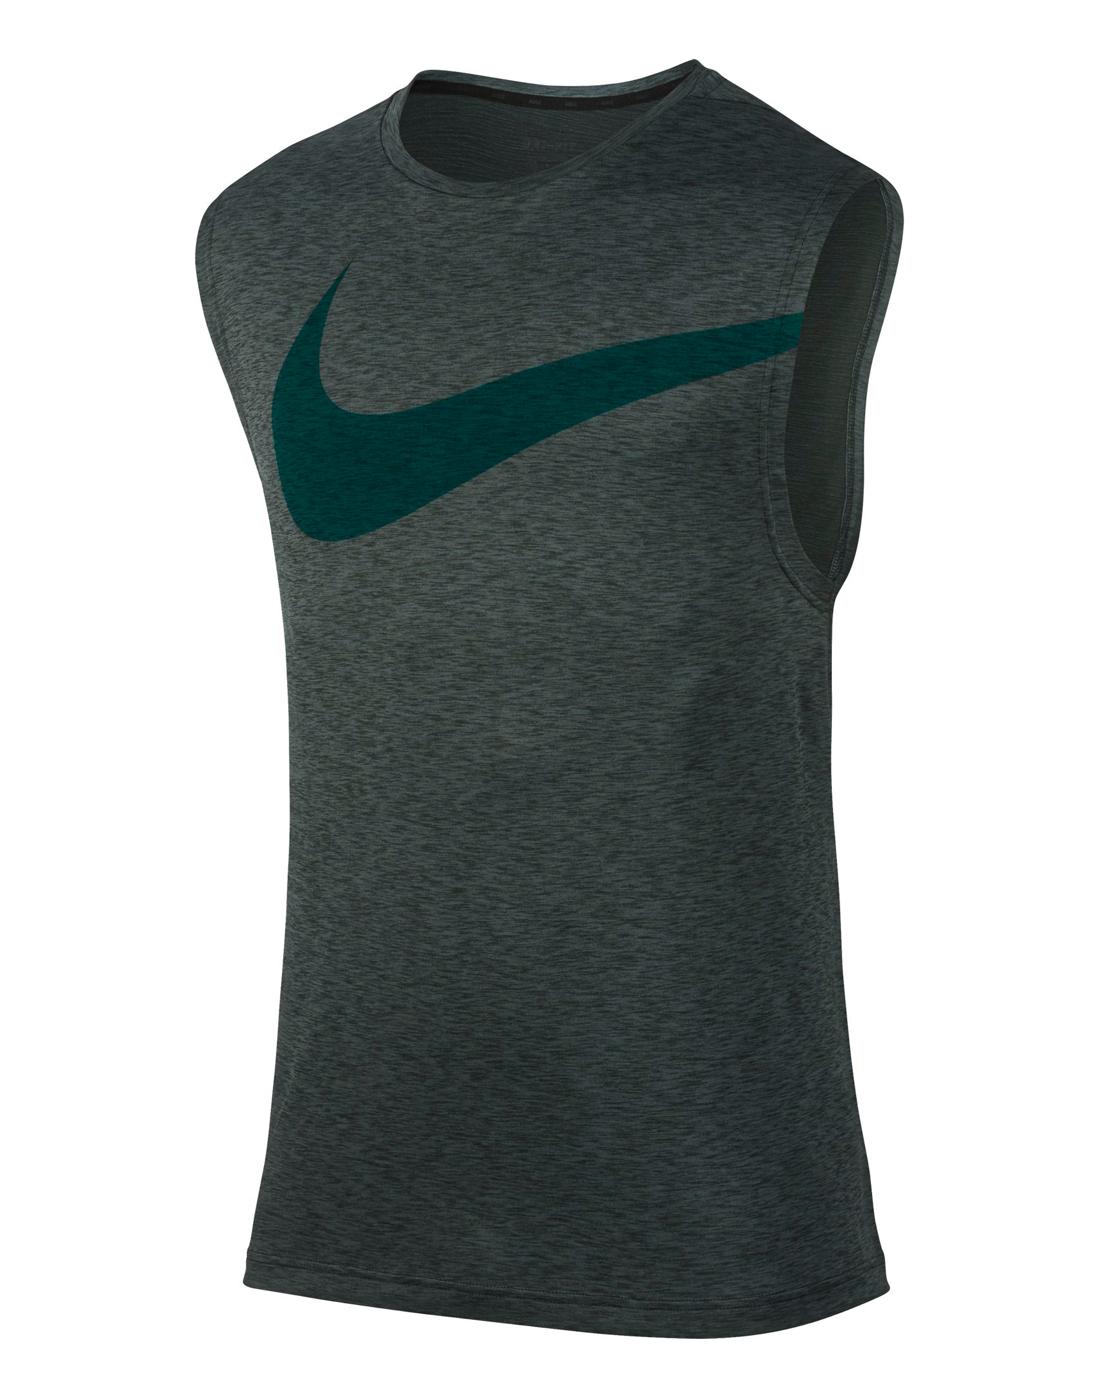 594b2cba6 Nike Mens Hyper-Dry Breathe Tank | Life Style Sports